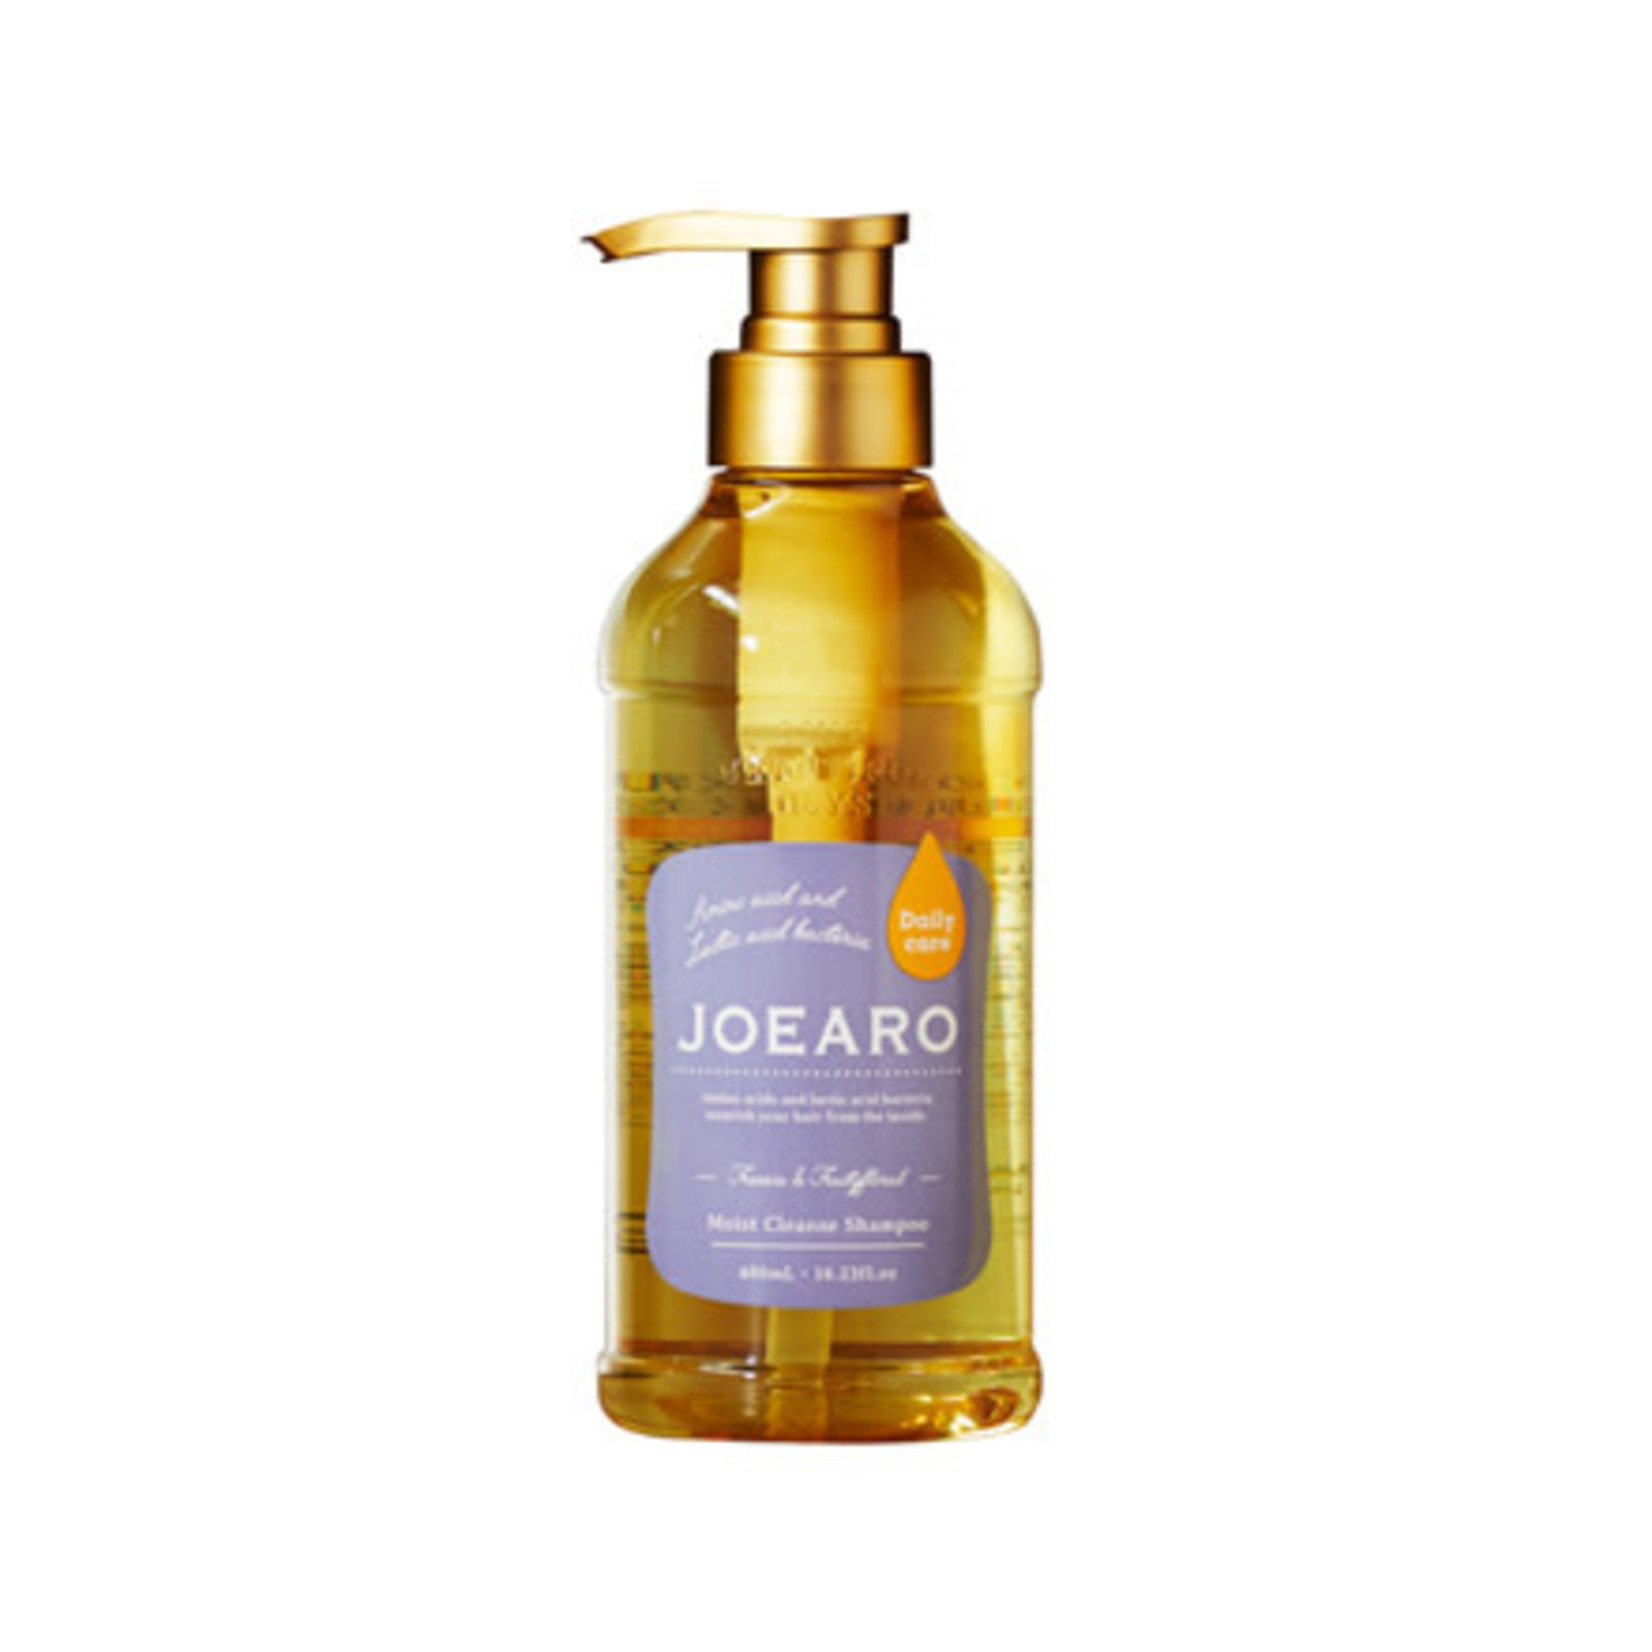 Joearo Moist Cleanse Shampoo